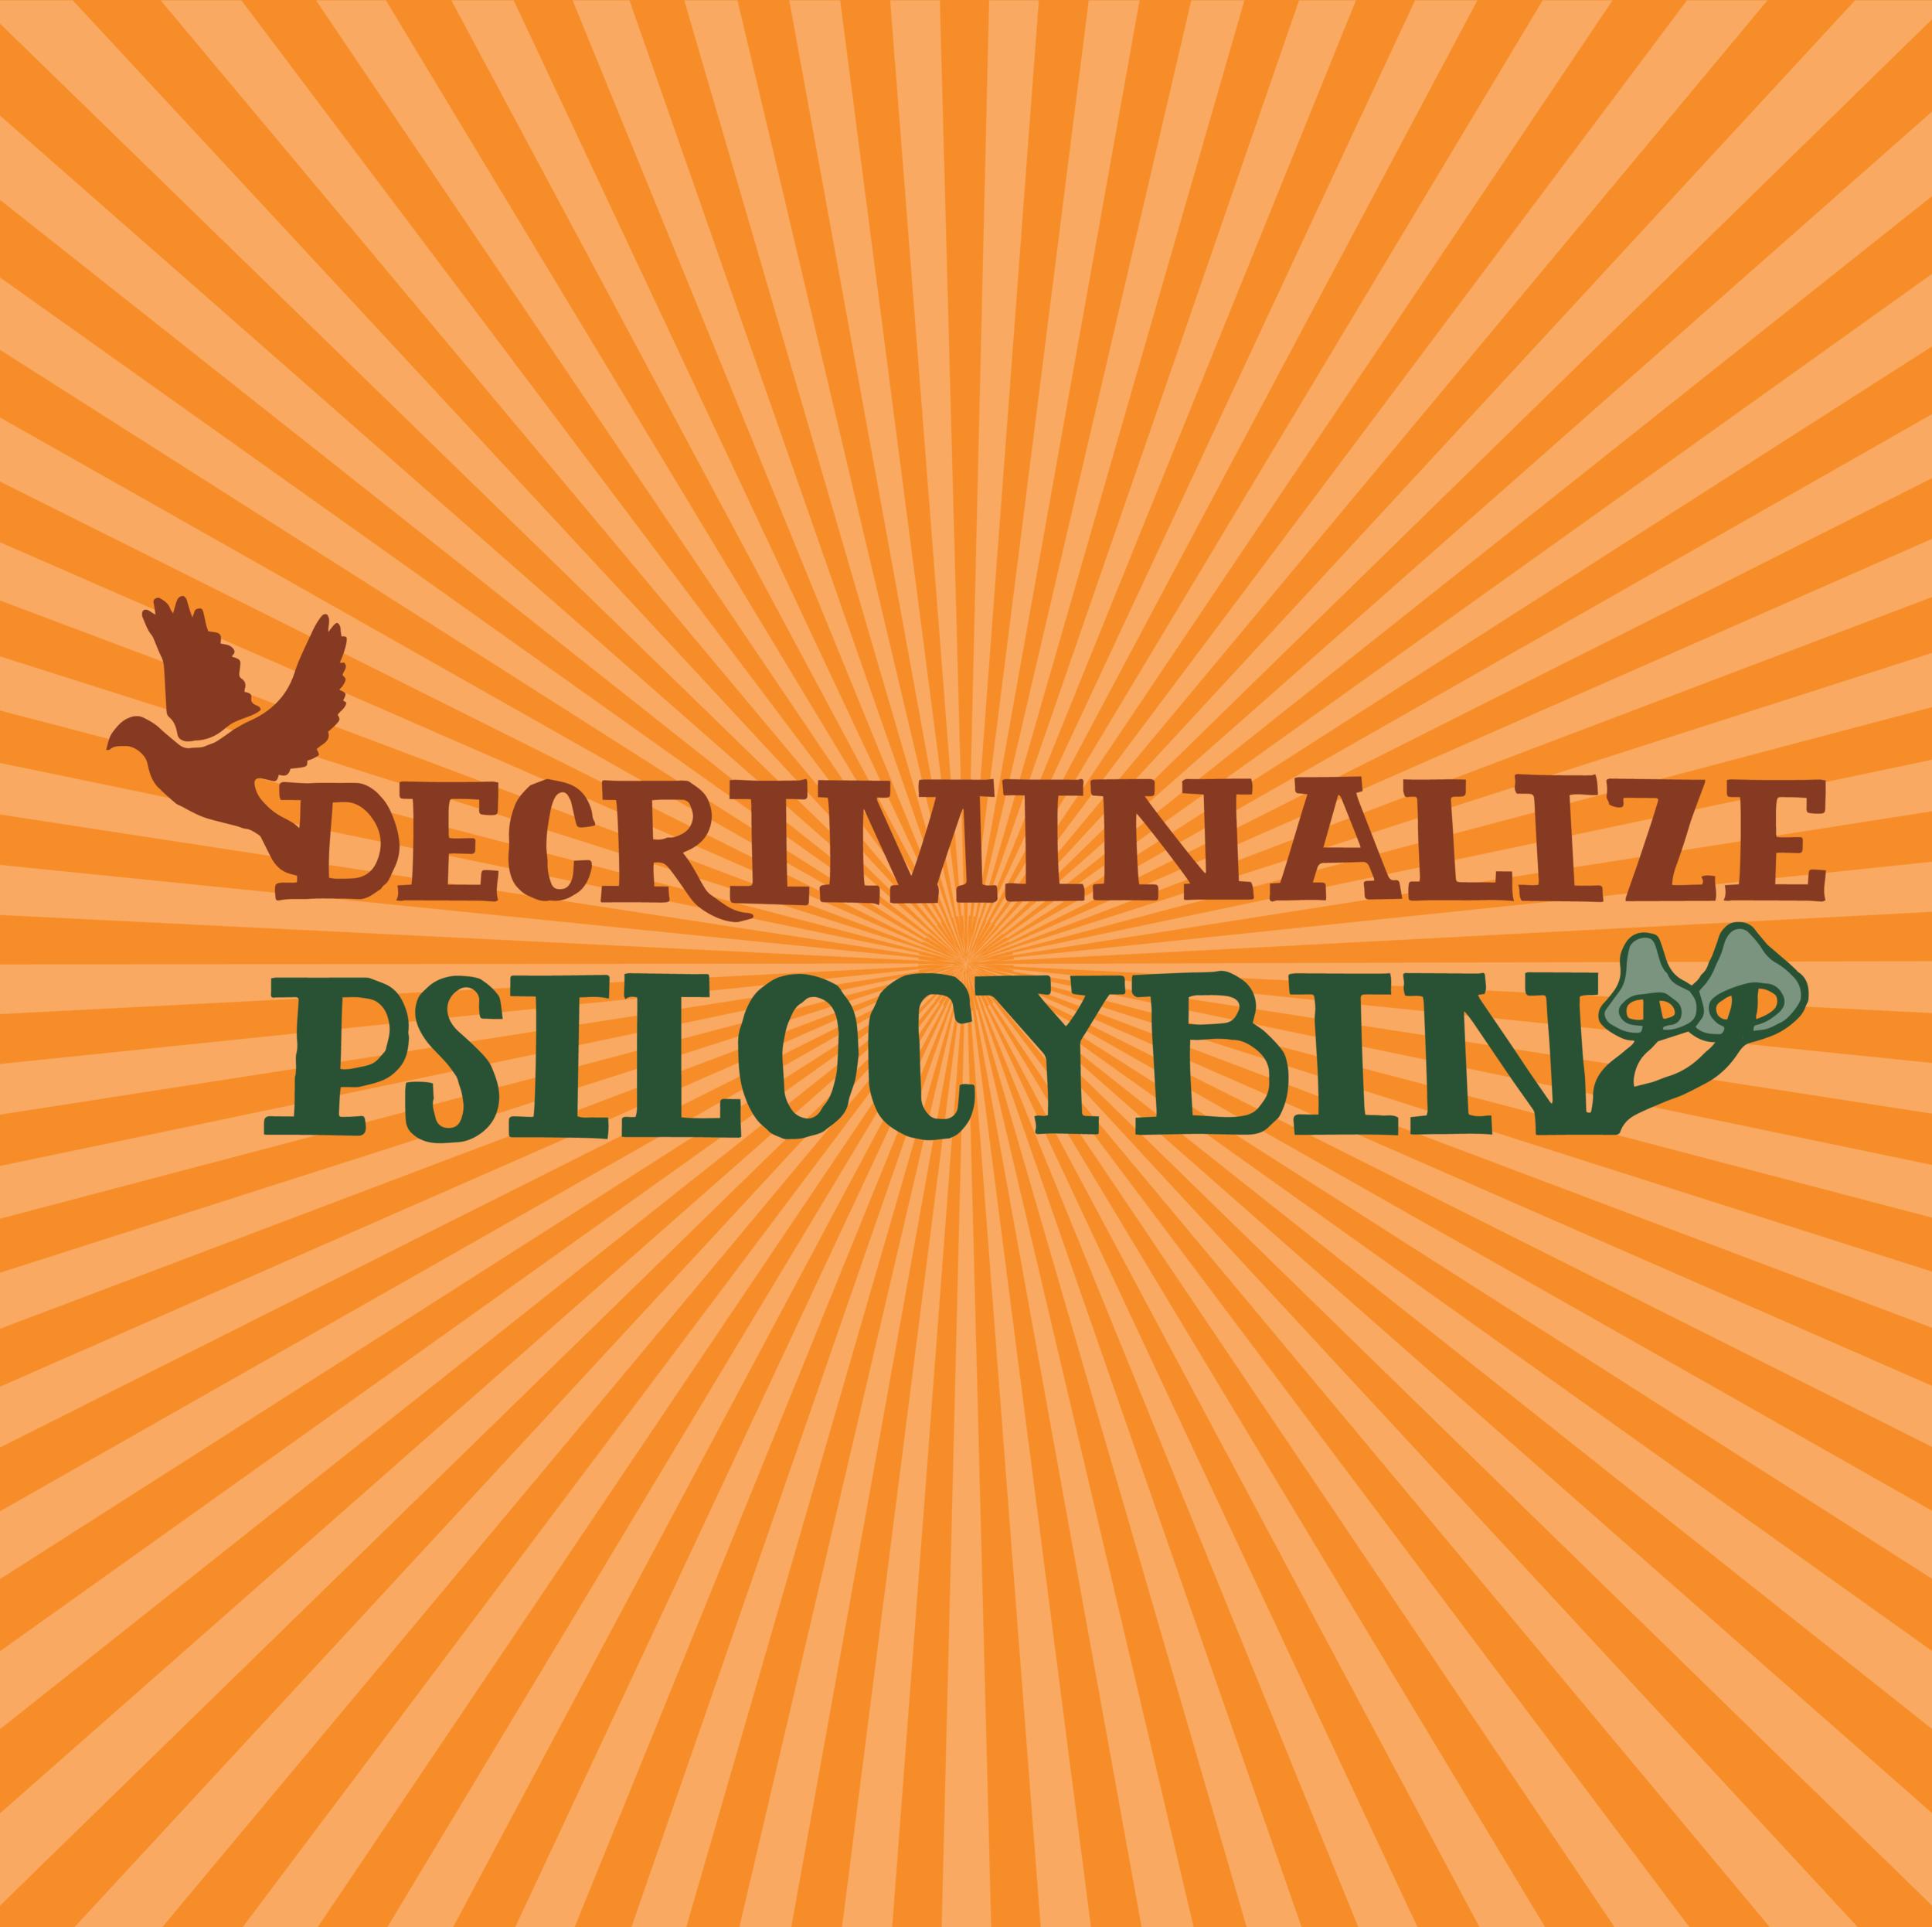 psilocybin-02.png